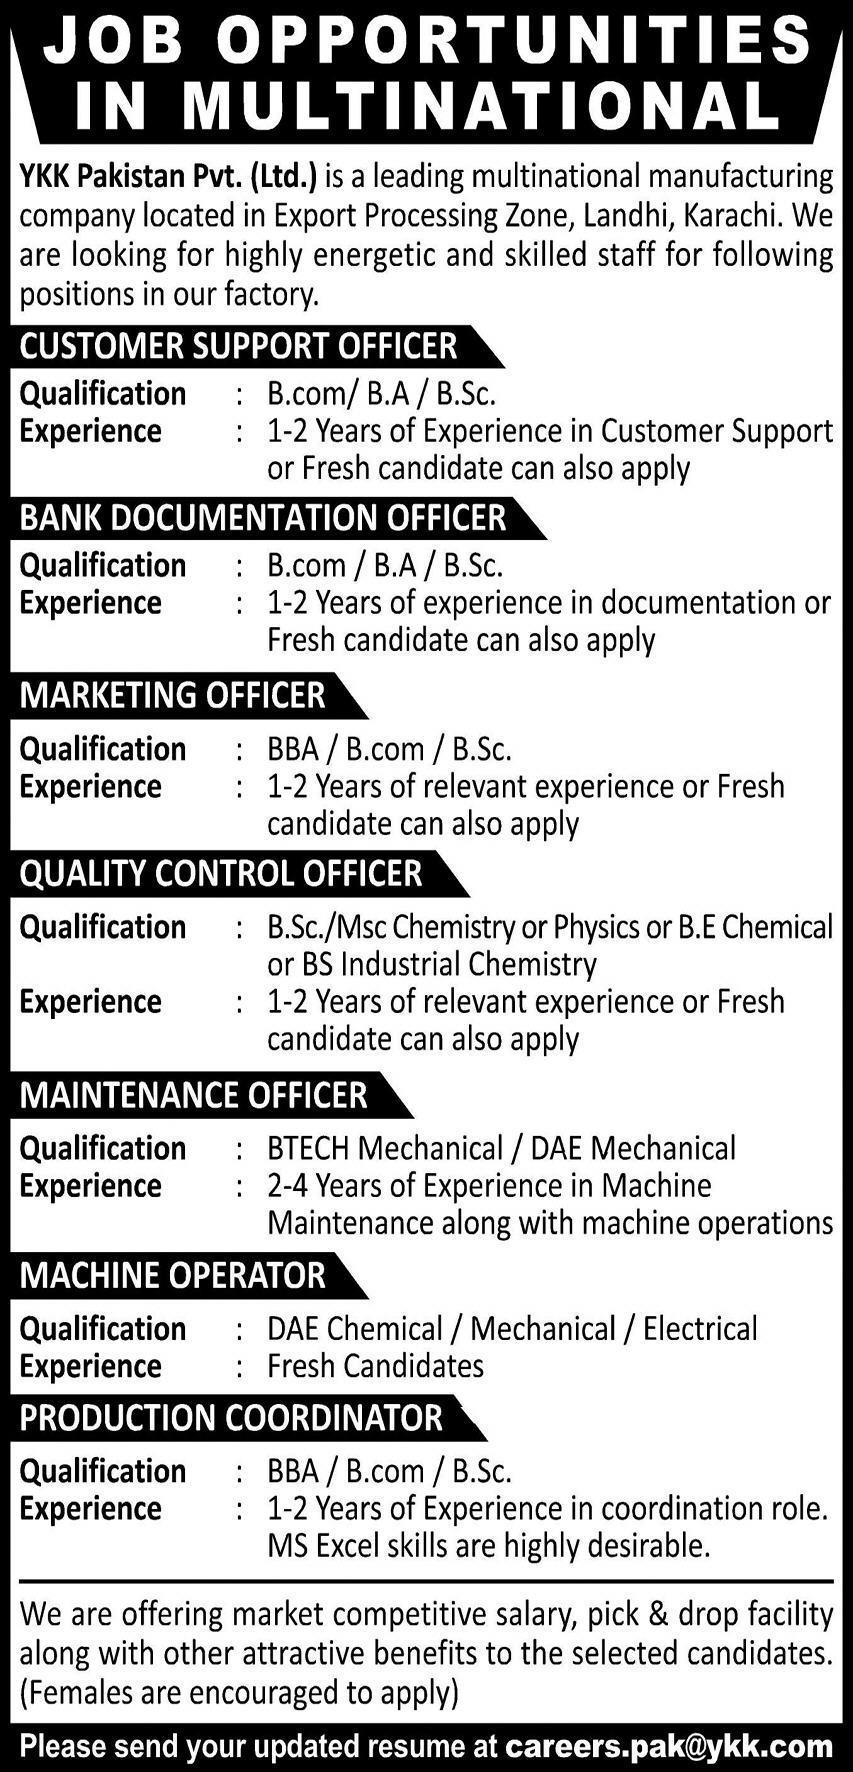 YKK Pakistan Private Limited Management Jobs 2021